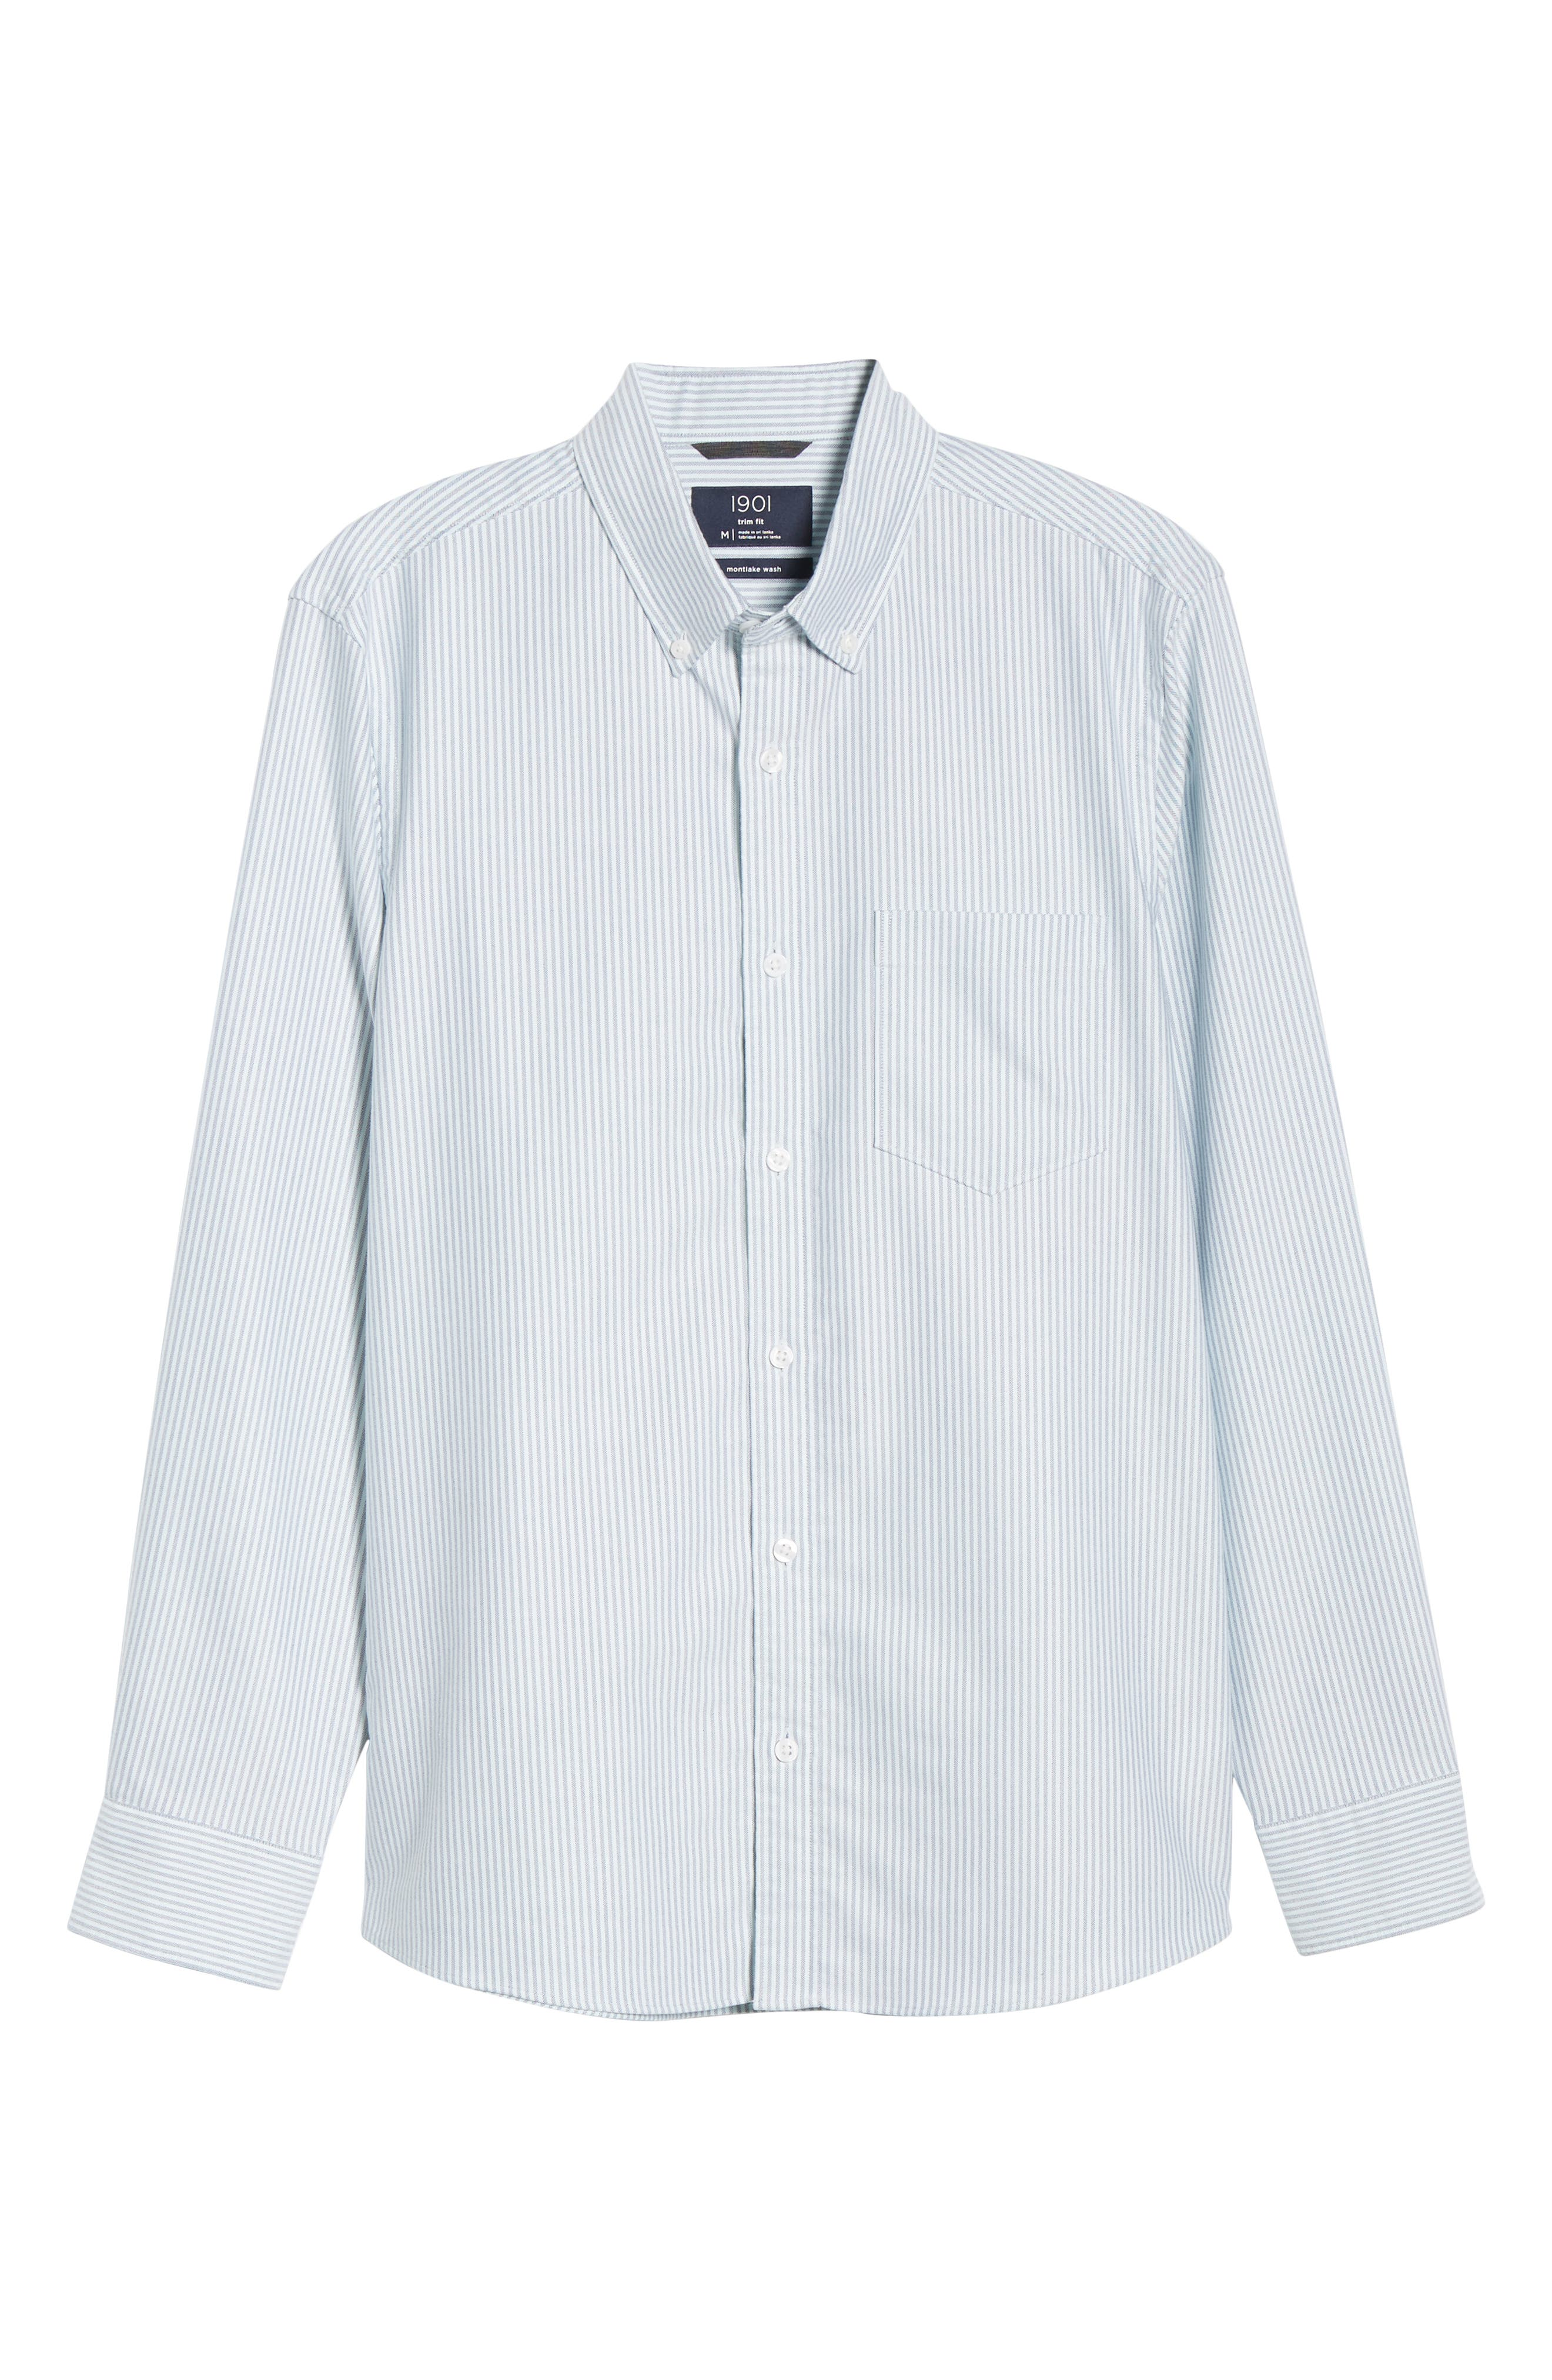 Trim Fit Bengal Stripe Sport Shirt,                             Alternate thumbnail 5, color,                             BLUE ENSIGN MINT STRIPE